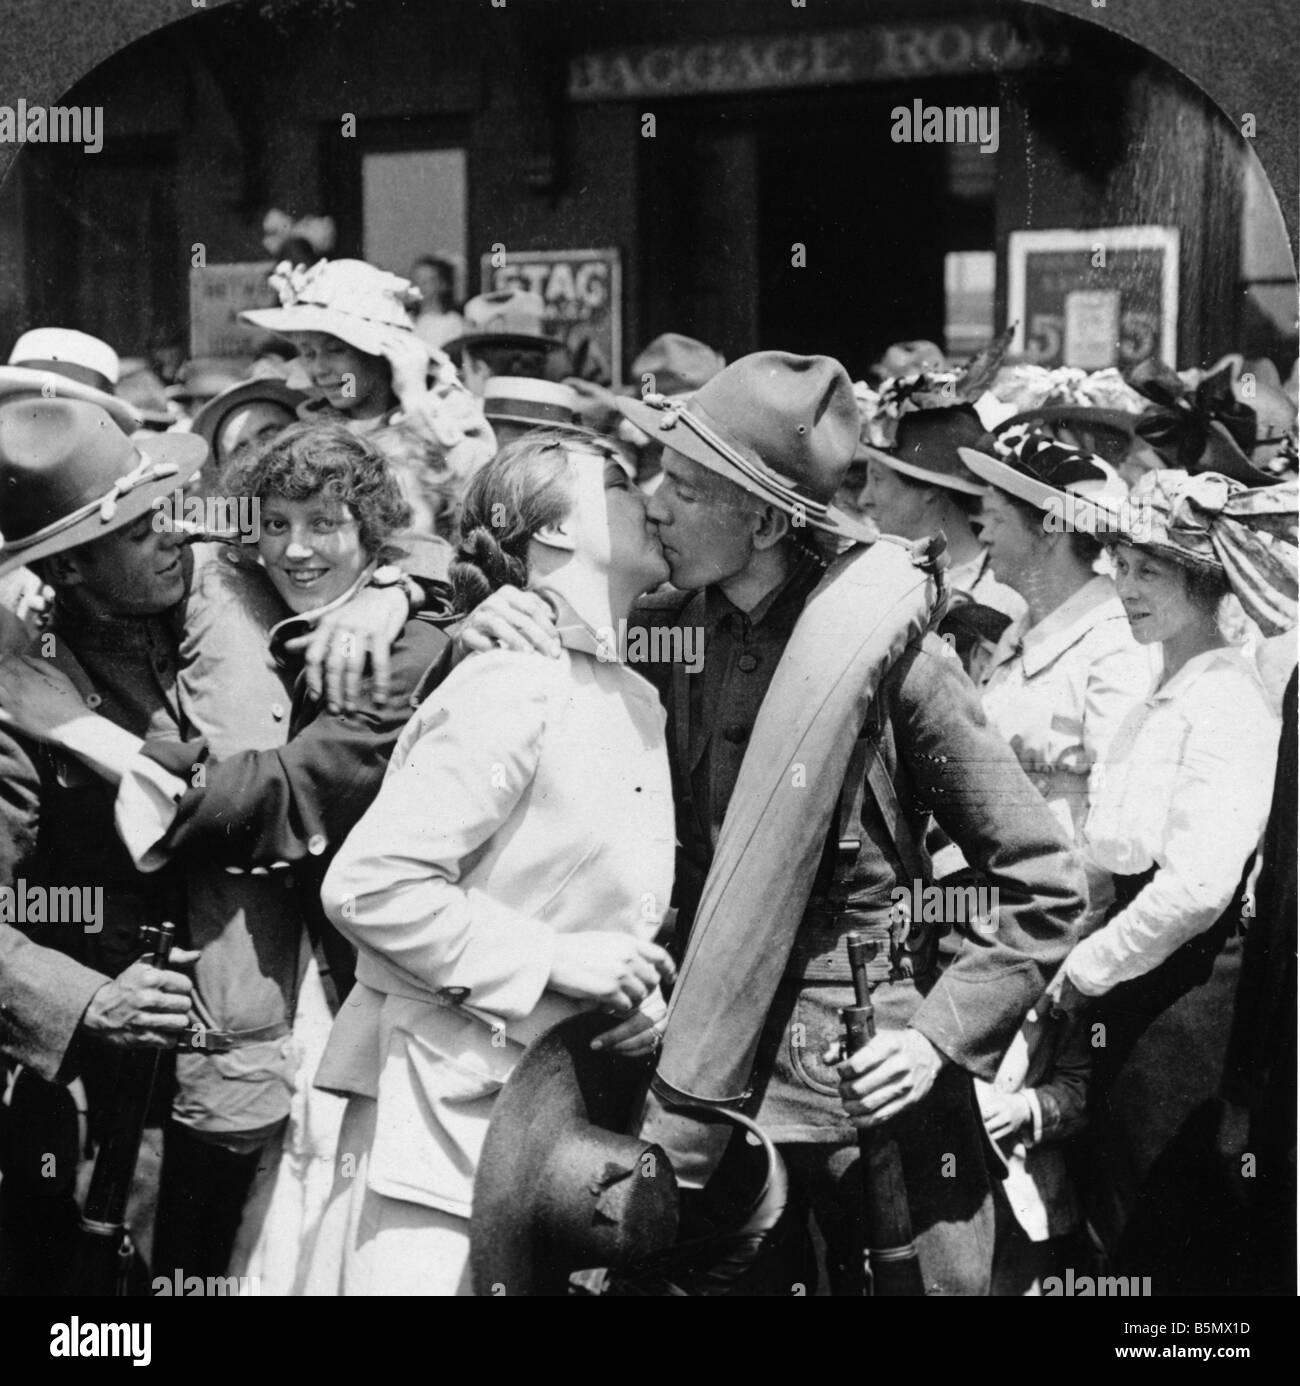 9US 1917 4 6 A1 1 Love Bids Him Stay USA 1917 World War One USA US  declaration of war on Germany 6 April 1917 Love Bids Him Stay